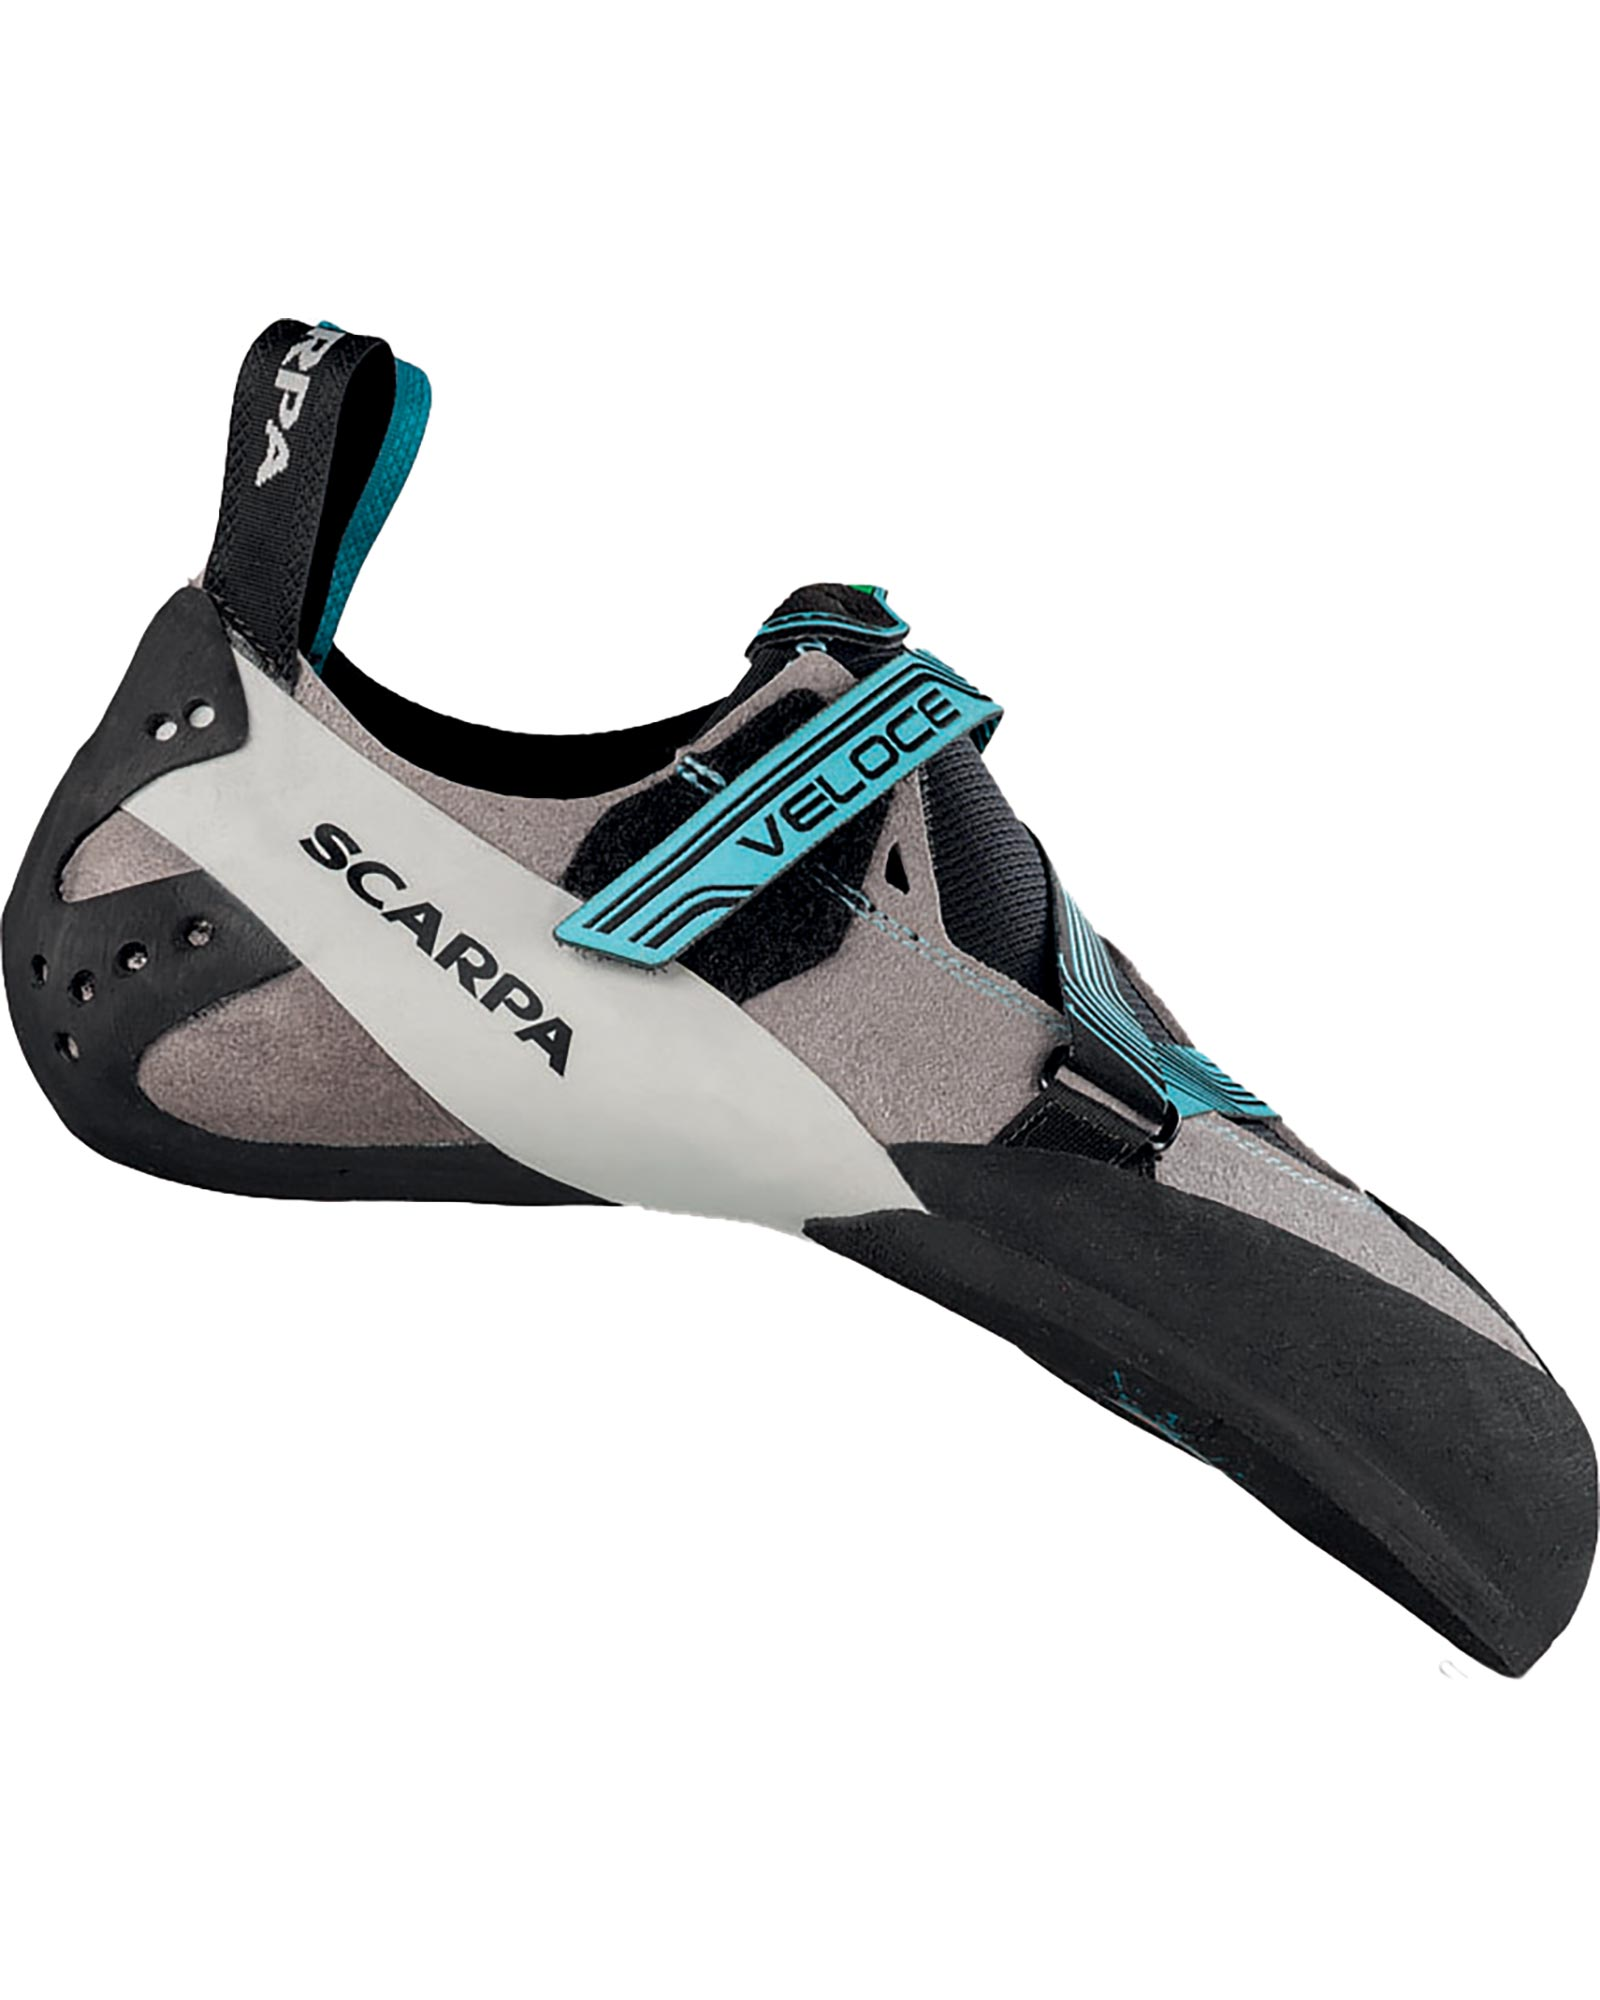 Scarpa Women's Veloce Climbing Shoes 0